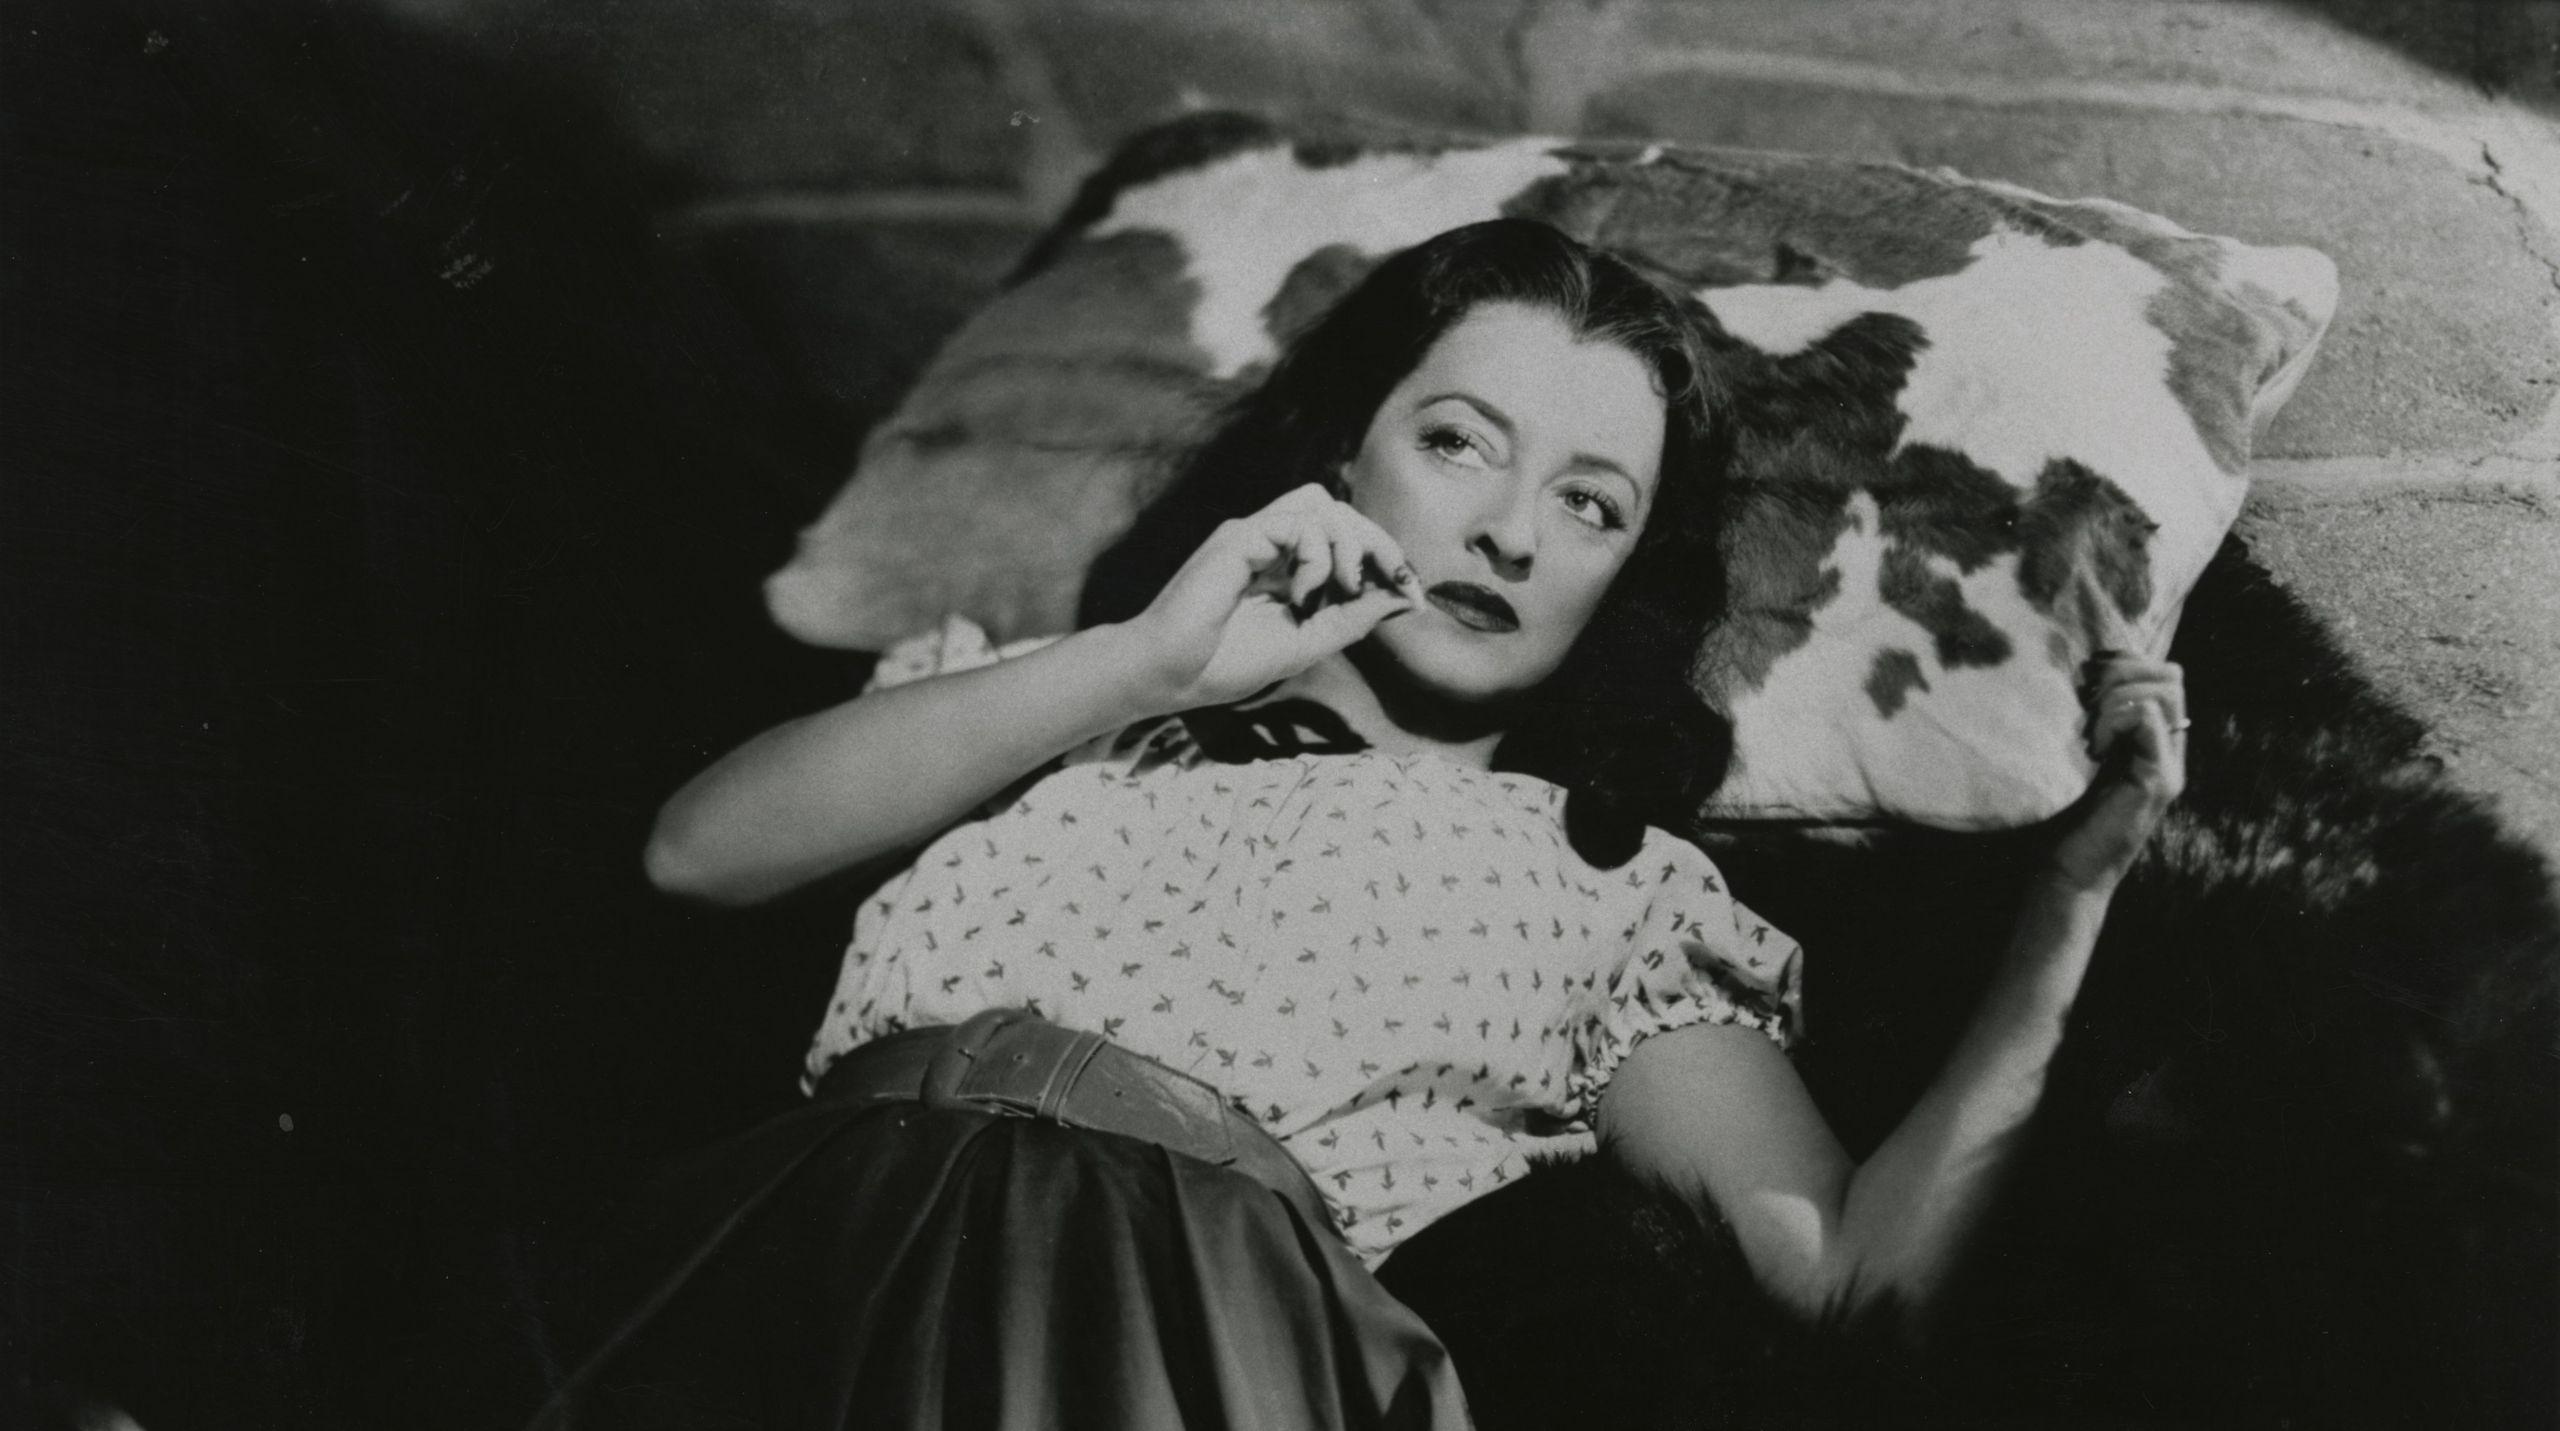 Bette Davies in Beyond the Forest (USA 1949, Regie: King Vidor)